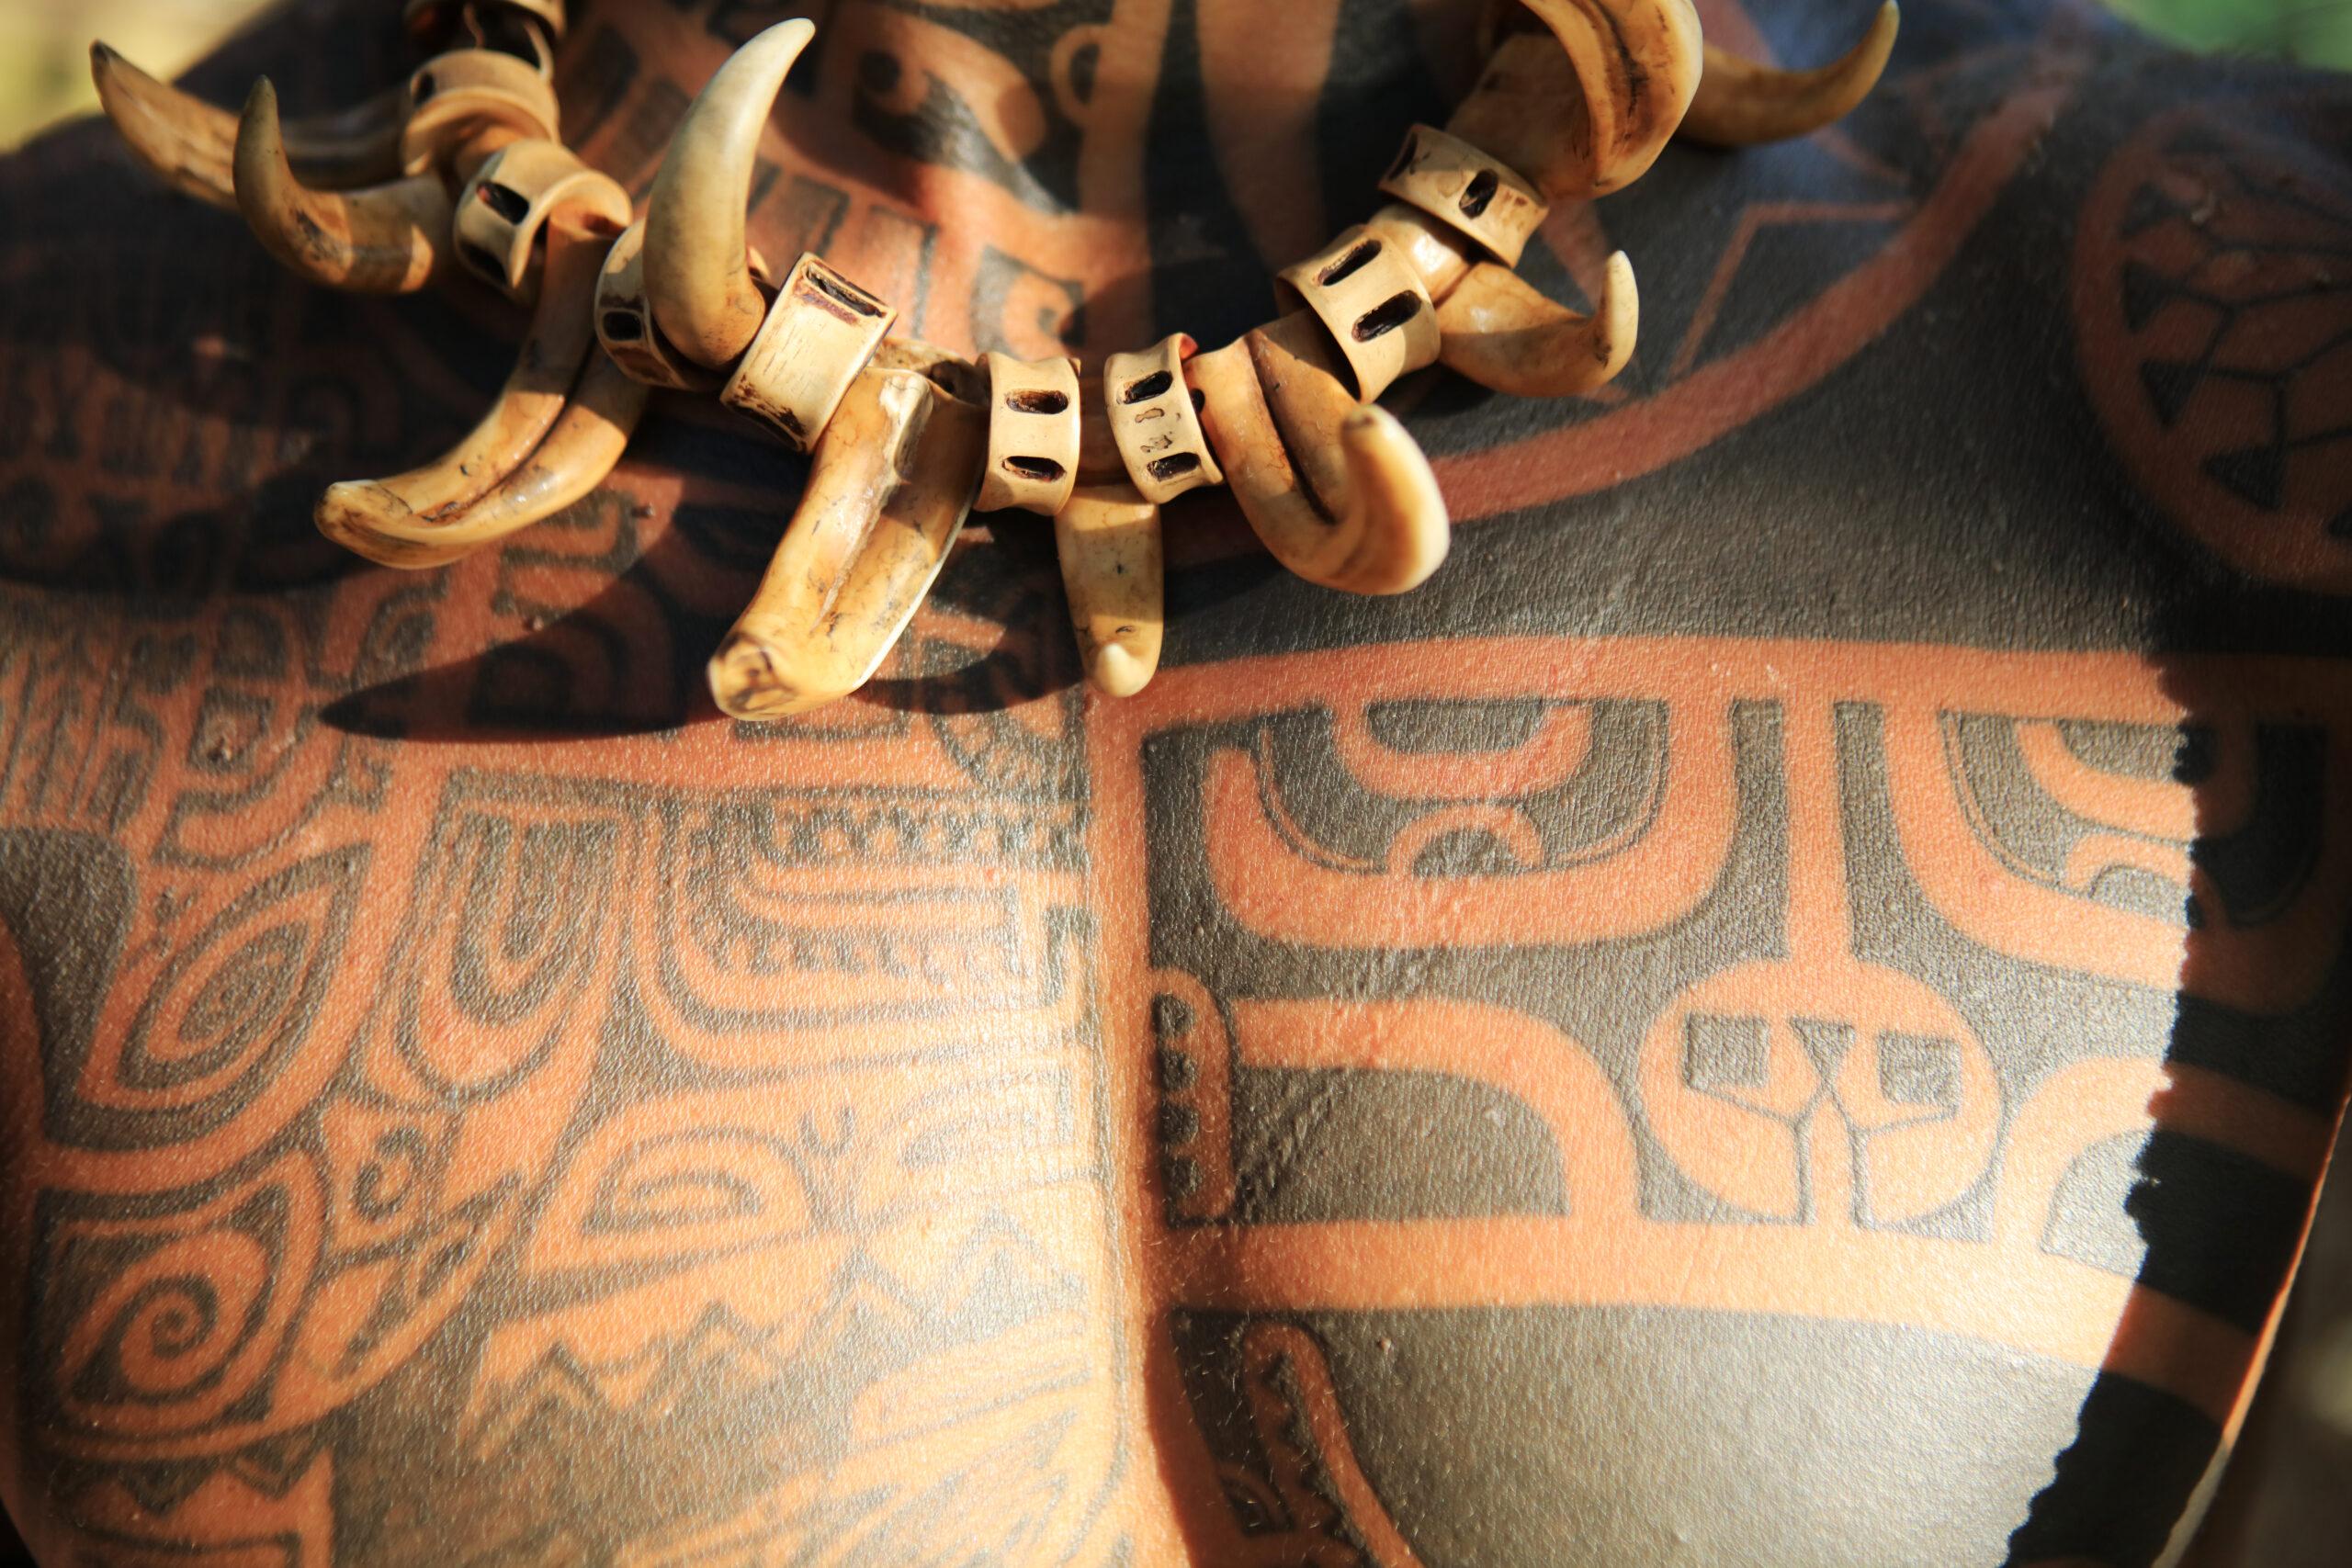 https://tahititourisme.fr/wp-content/uploads/2021/10/7-tatau-P2_03_Tahuata_750A2593_©-Tahiti-Tourisme-scaled.jpg